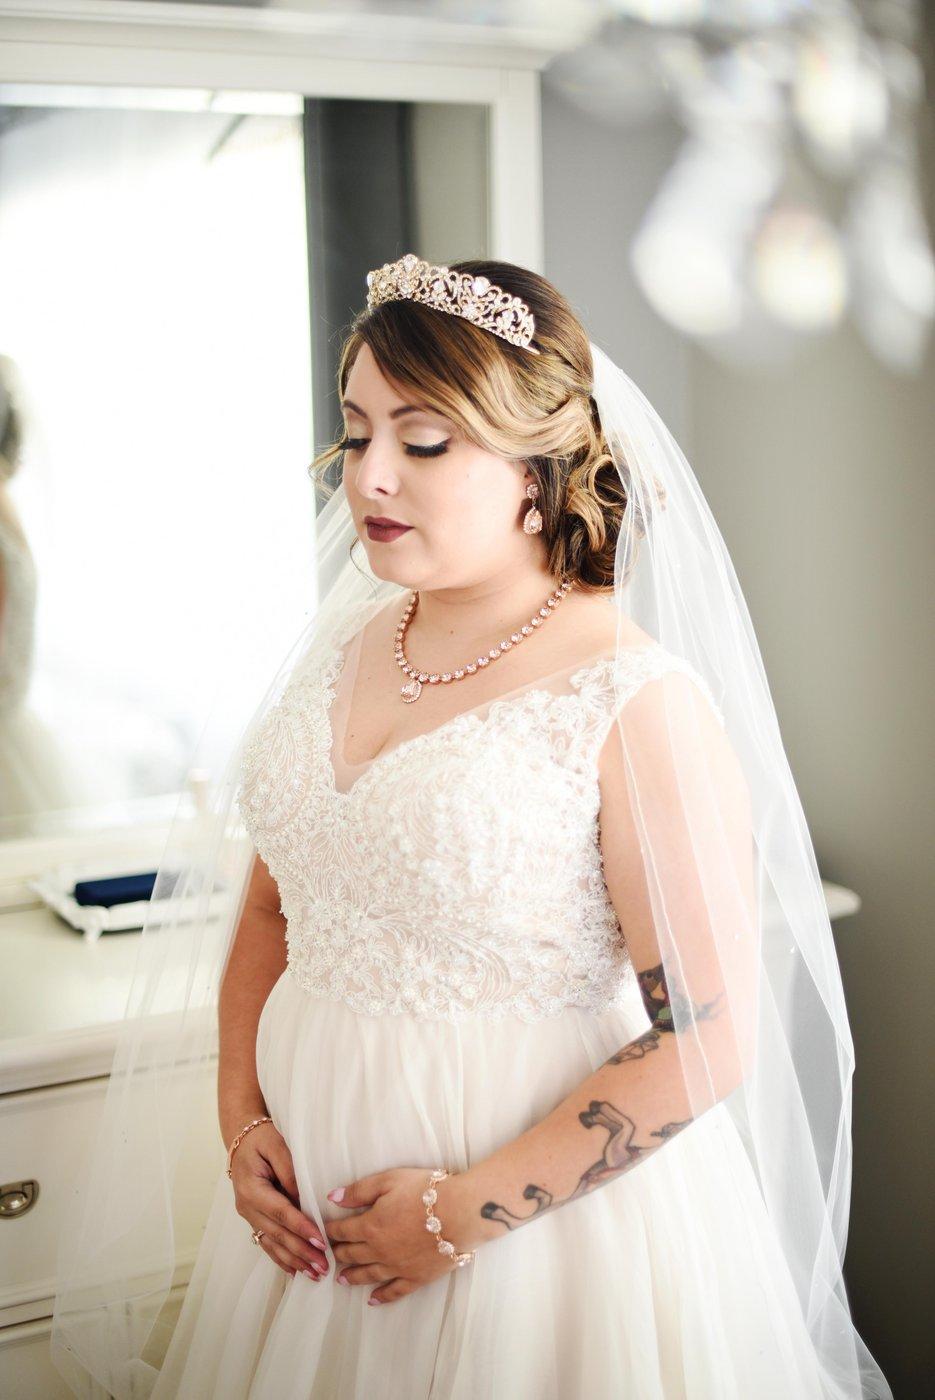 Bride's Instagram: @briarandmama